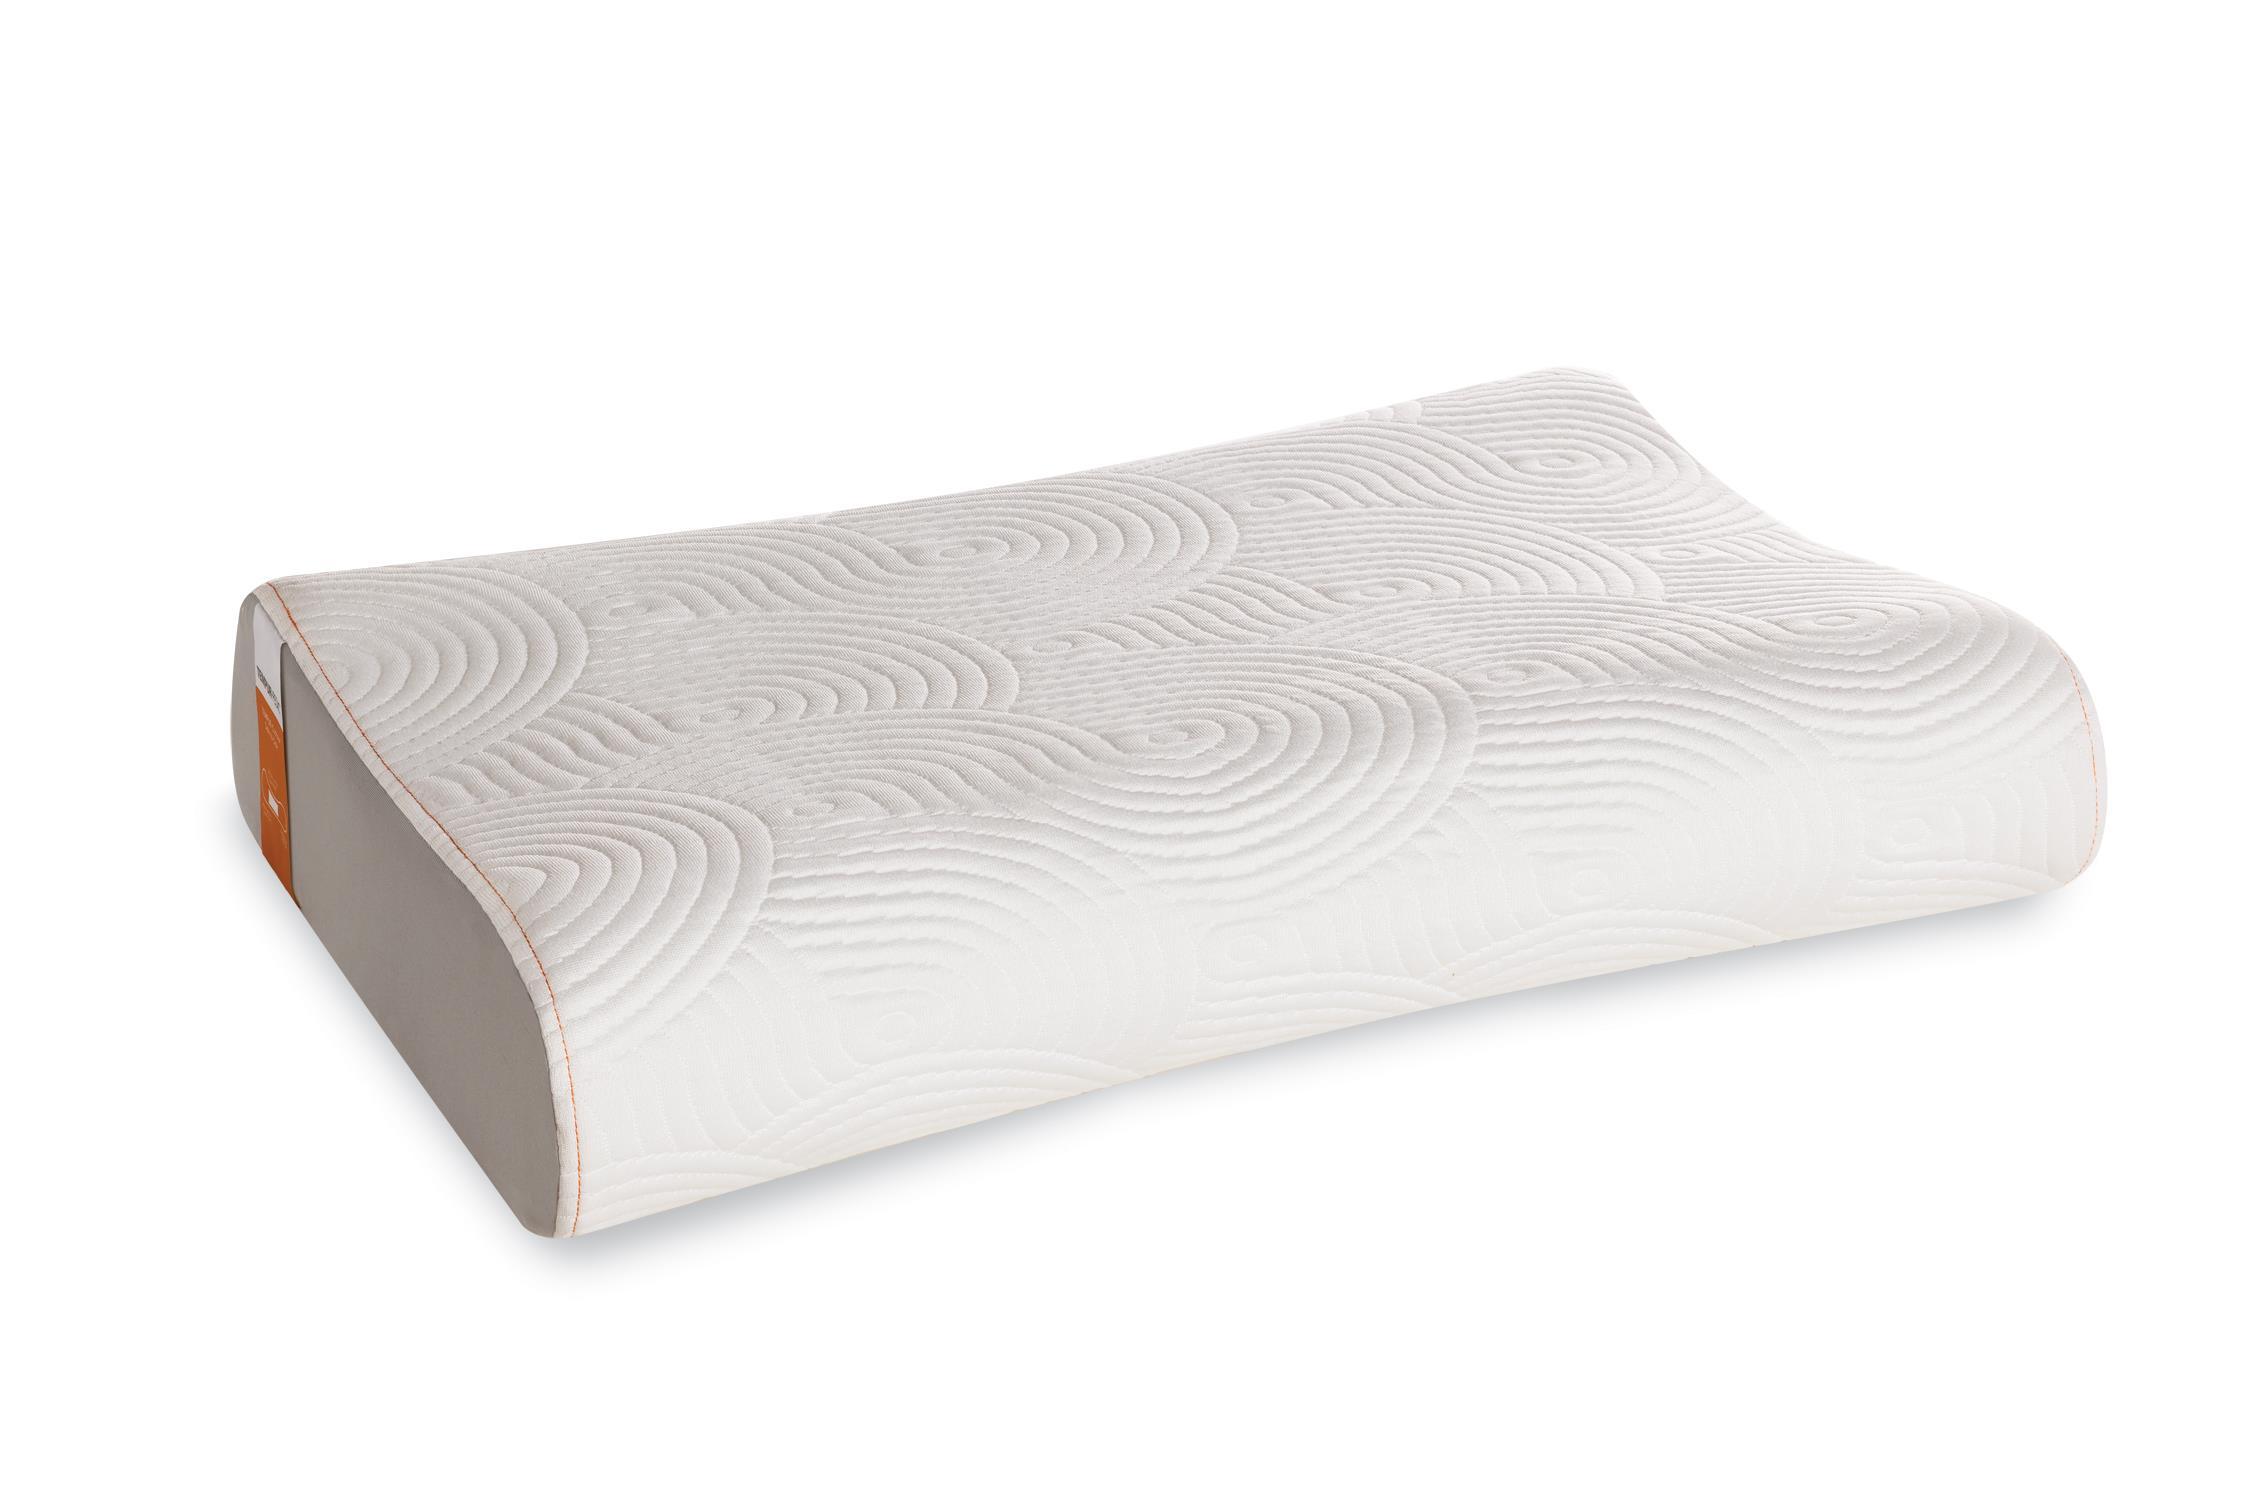 TEMPUR® Contour Side-to-Side Pillow